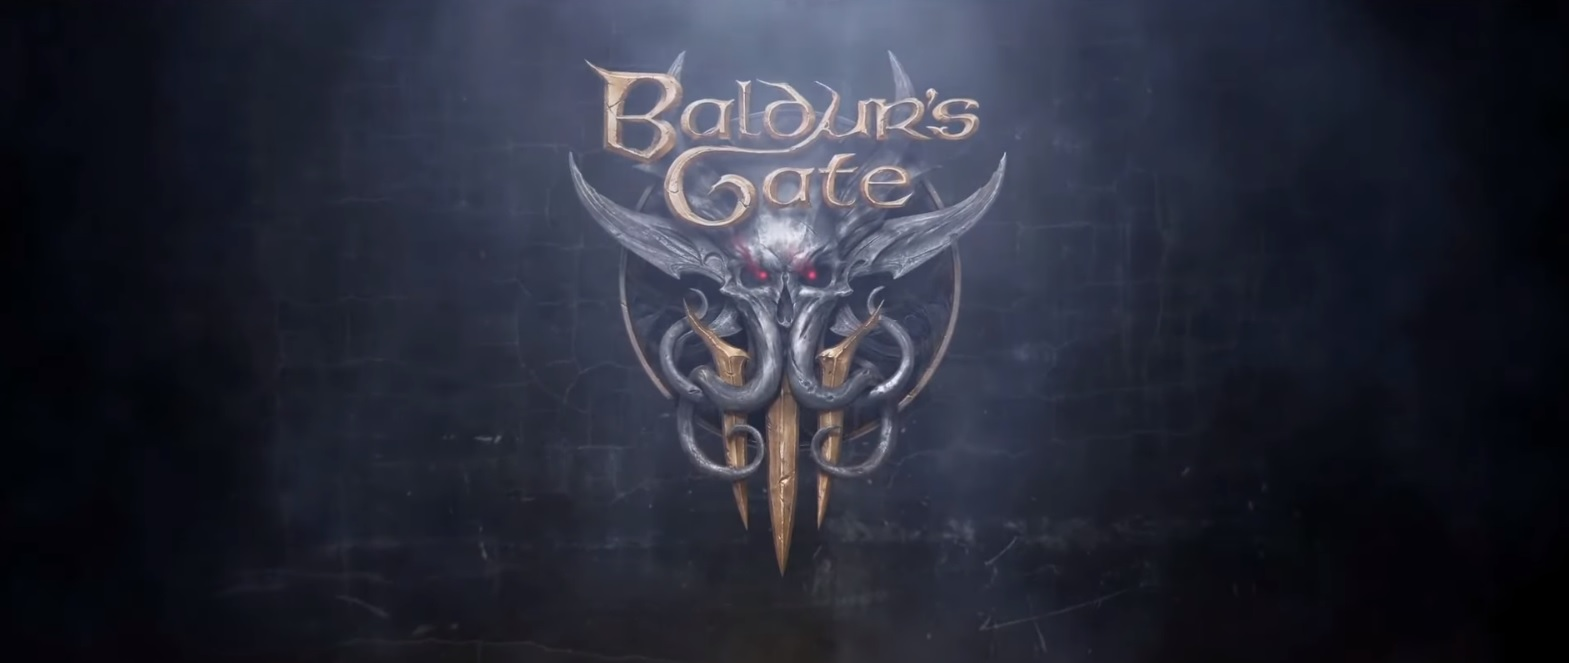 Baldurs Gate 3 logo gameplay